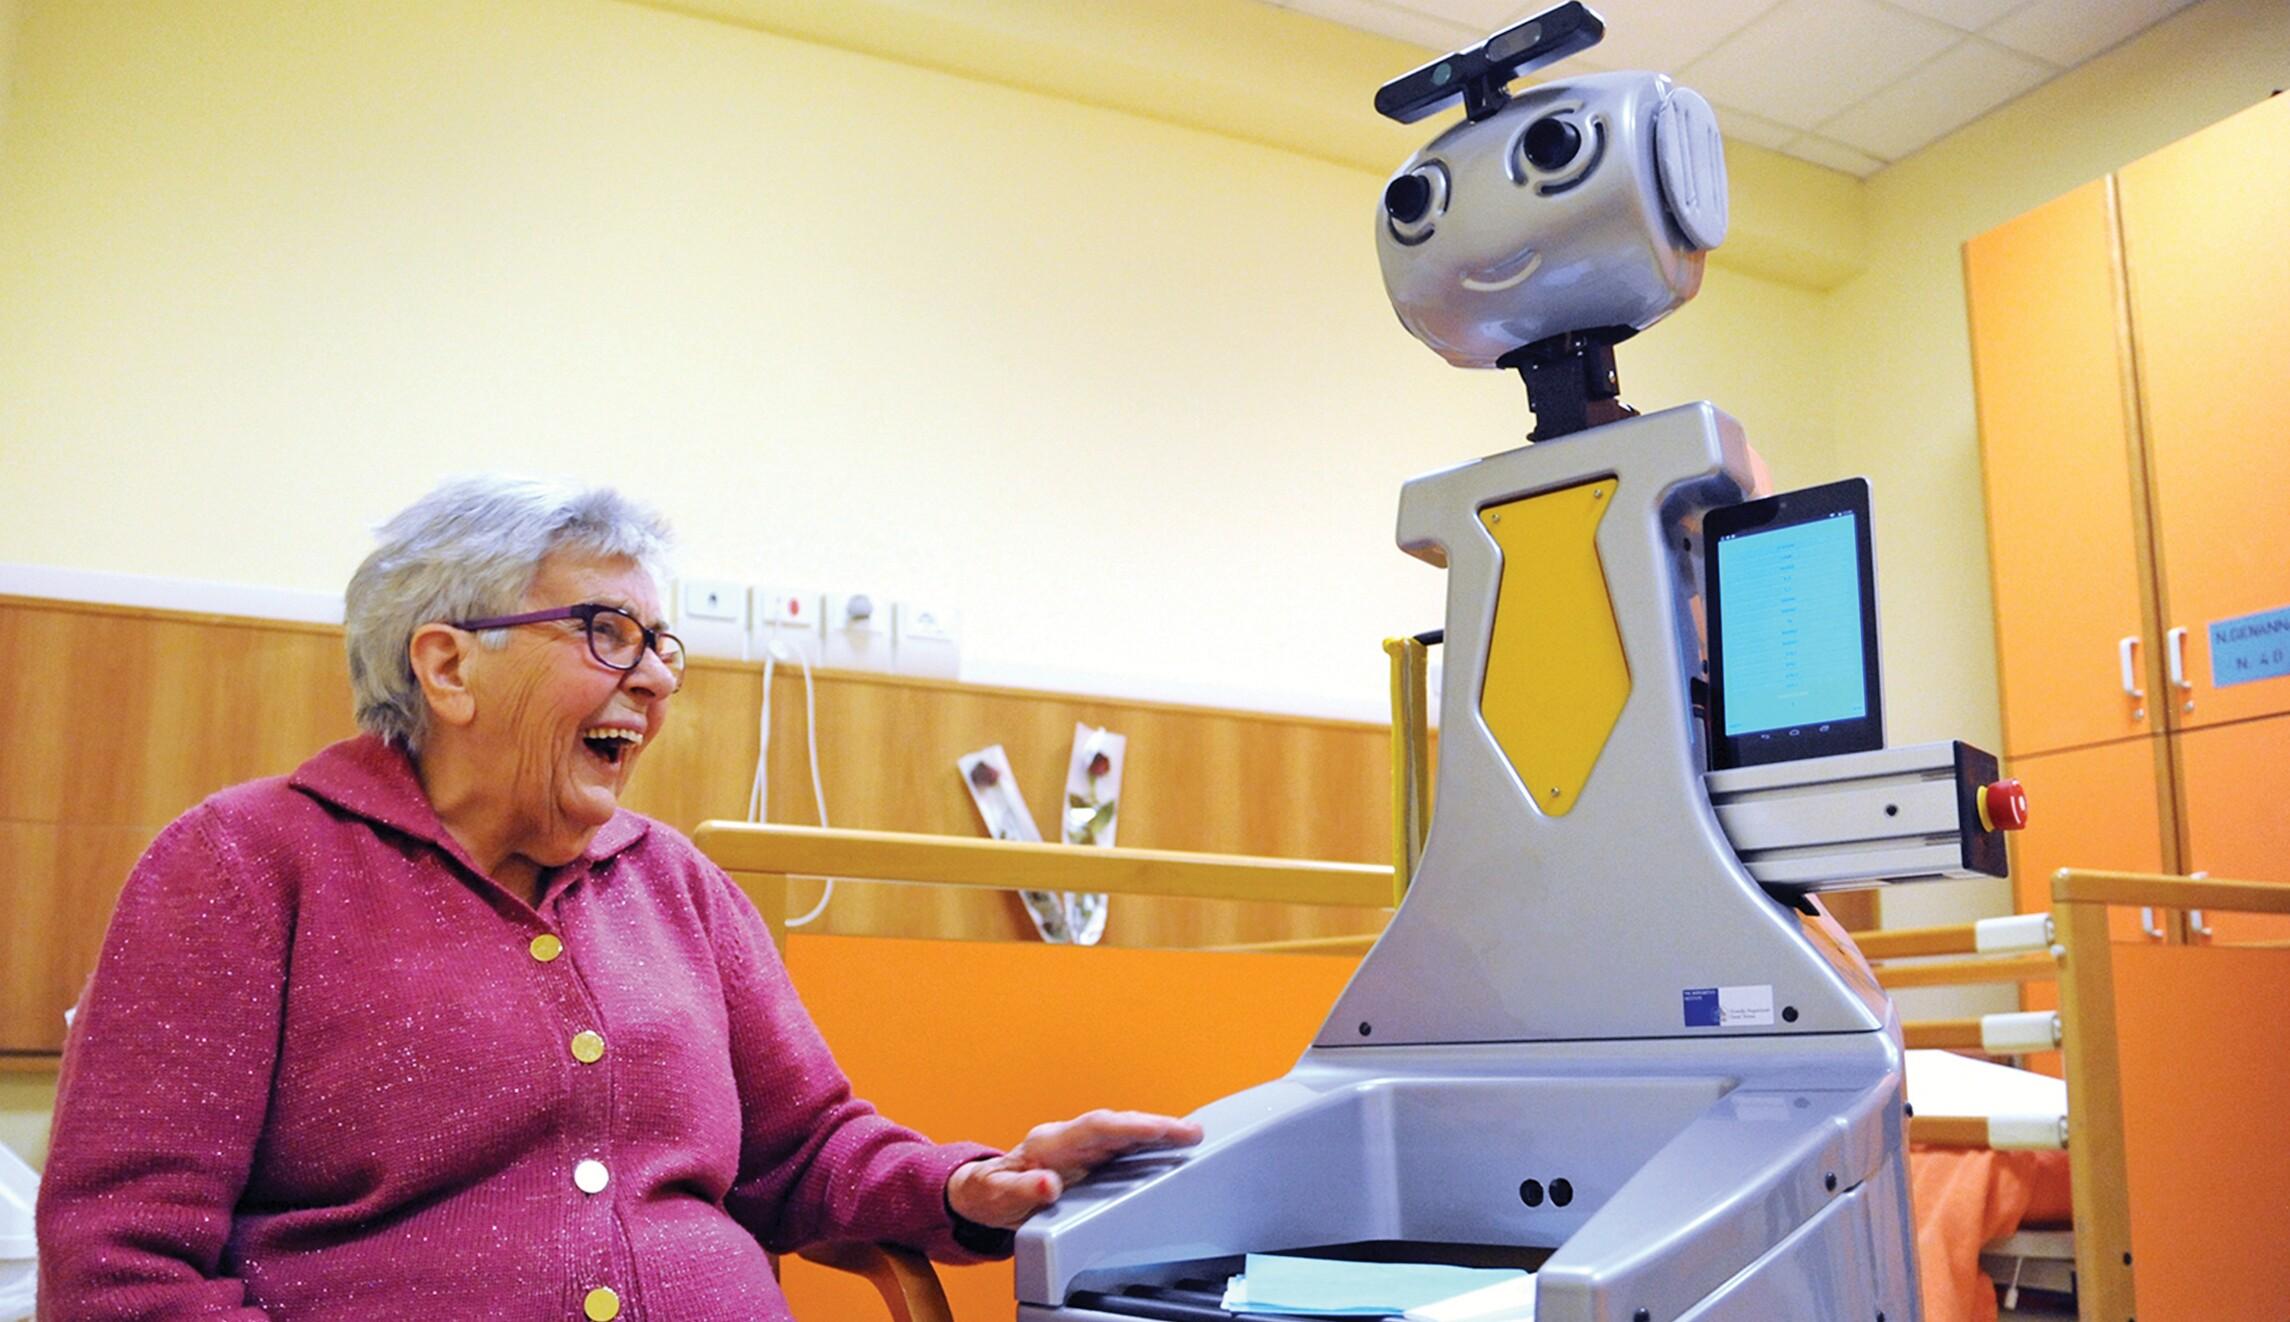 Meet your robot caretaker